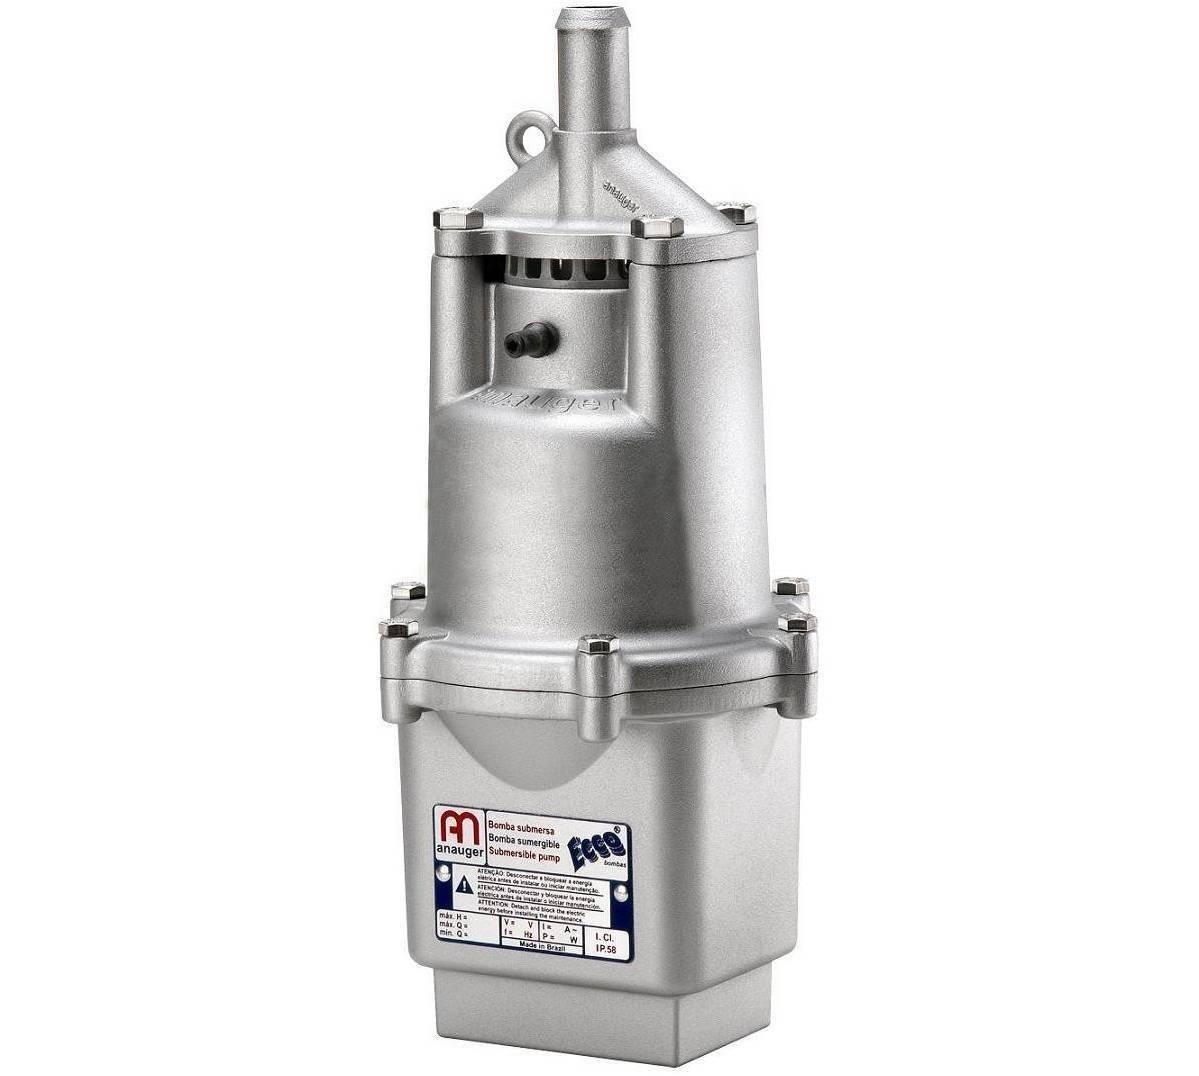 Bomba D´agua Submersa Vibratória Anauger Ecco 1400/hora 300w 110 Volts